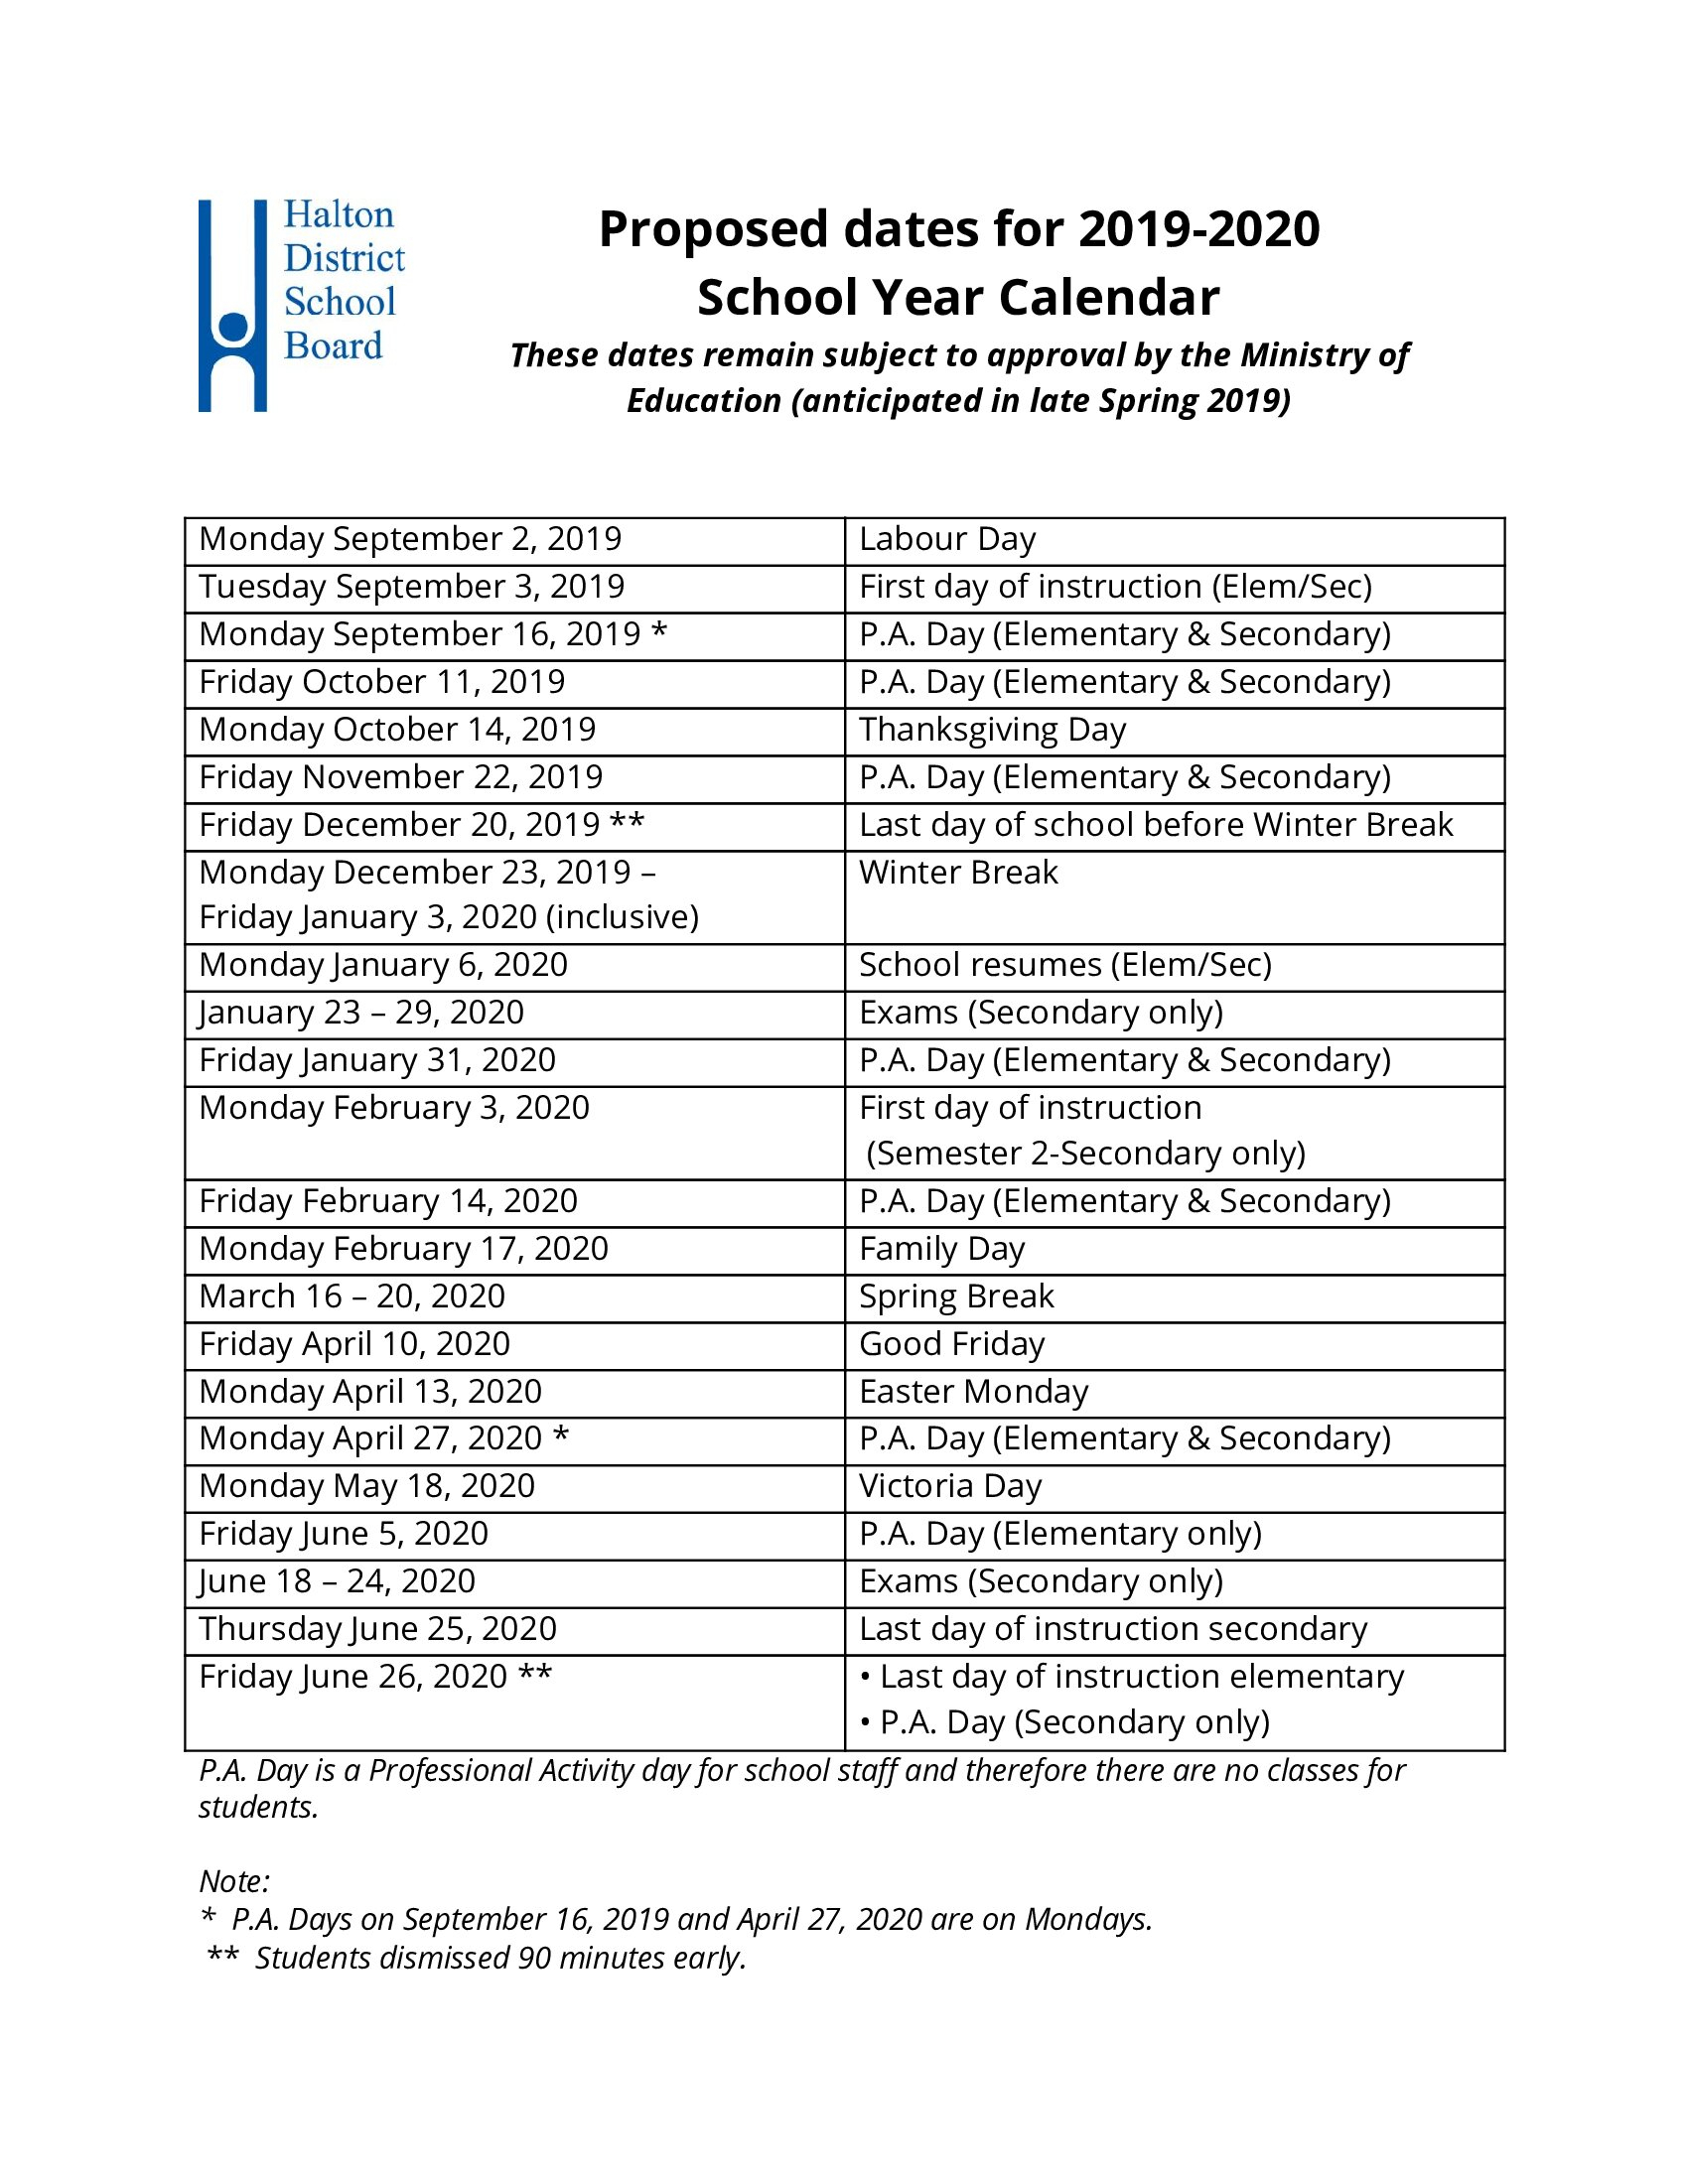 Proposed 2019-2020 School Year Calendar Approvedboard Of throughout School Year Calender For 2021 Ydsb